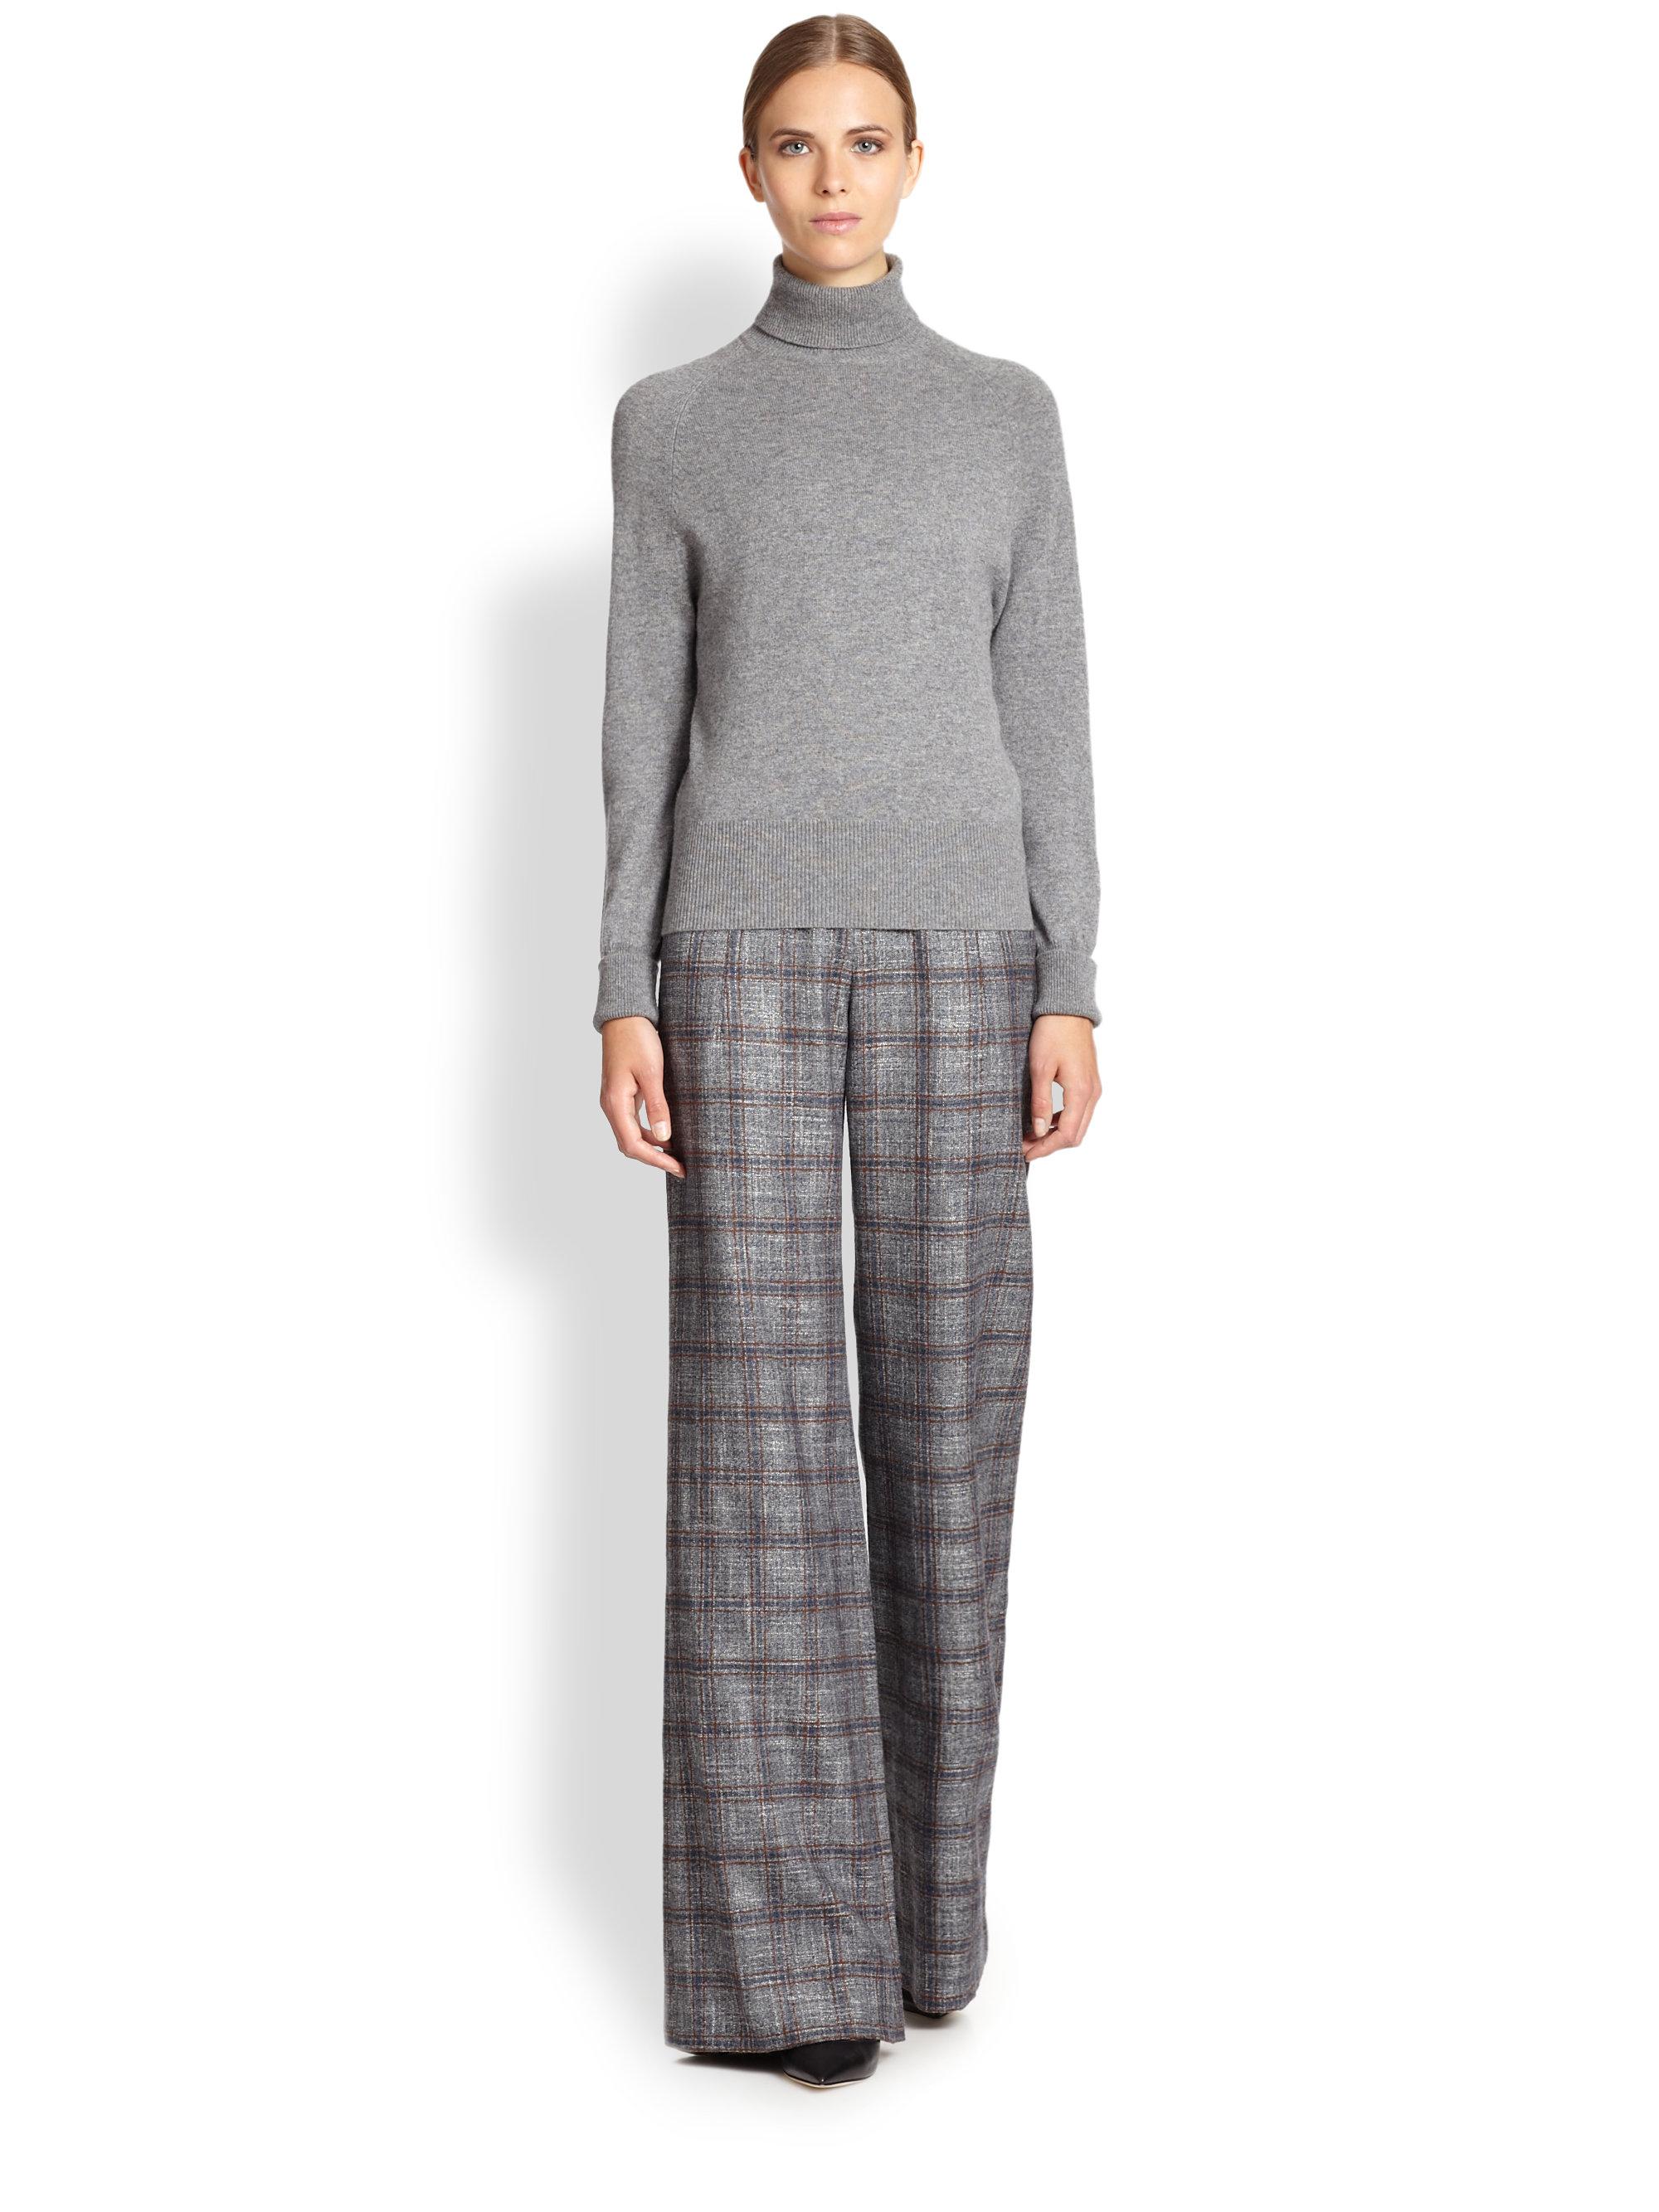 Carolina herrera Plaid Slim-Leg Pants in Gray | Lyst